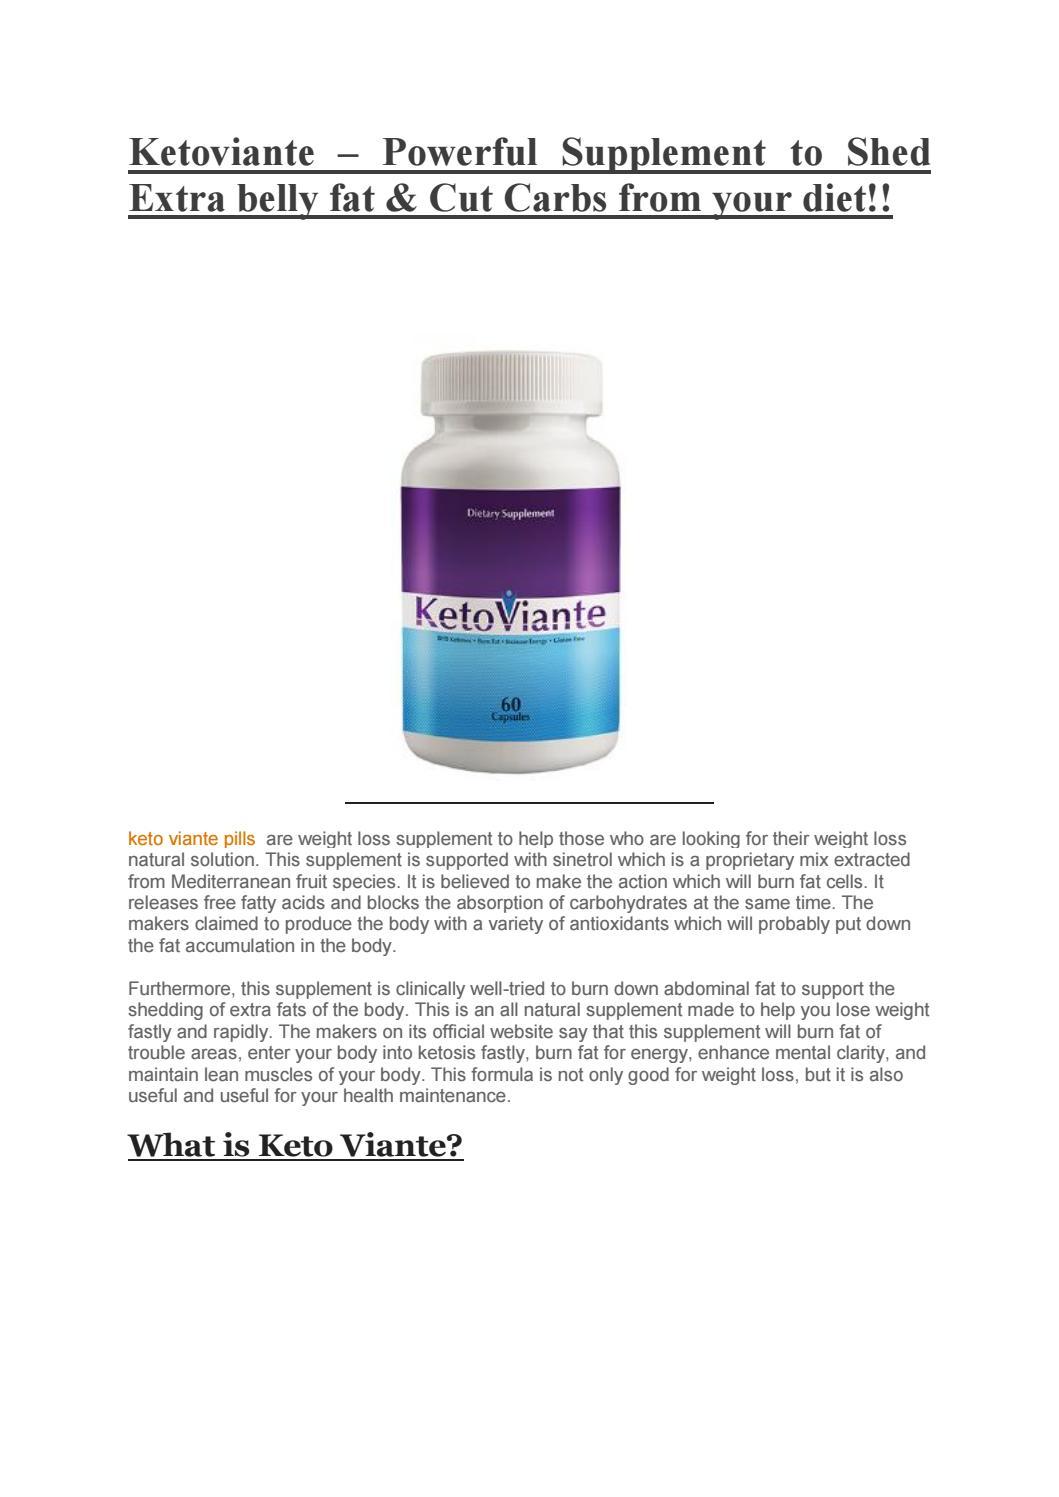 Keto Viante Pills By Rediffmail723